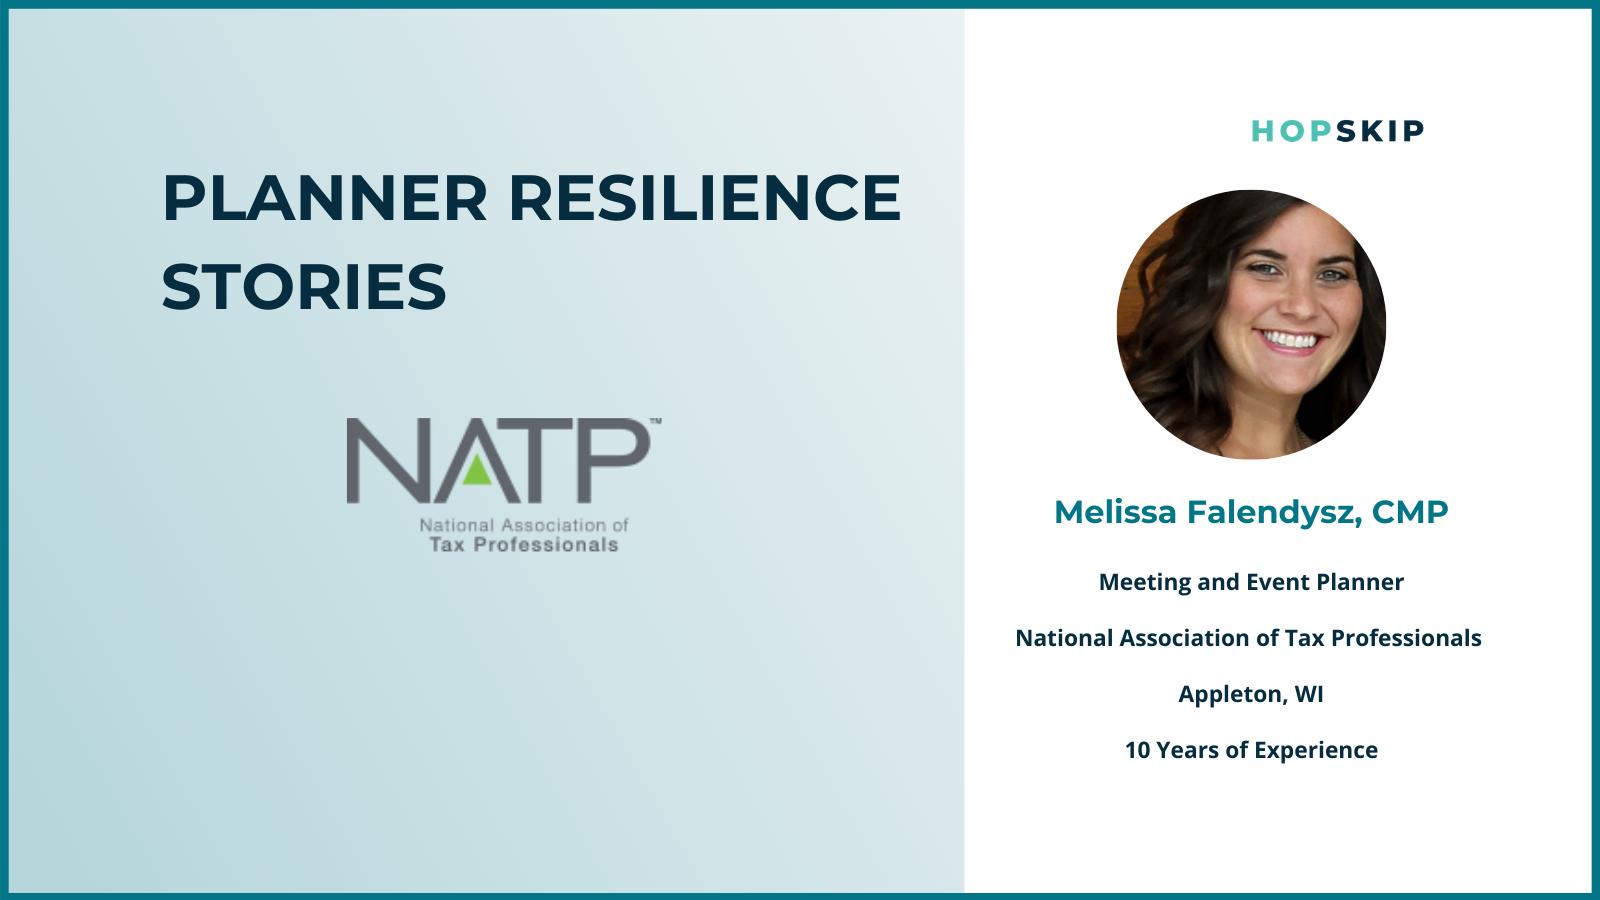 Melissa Falendysz, NATP HopSkip Planner Resilience Spotlight Series